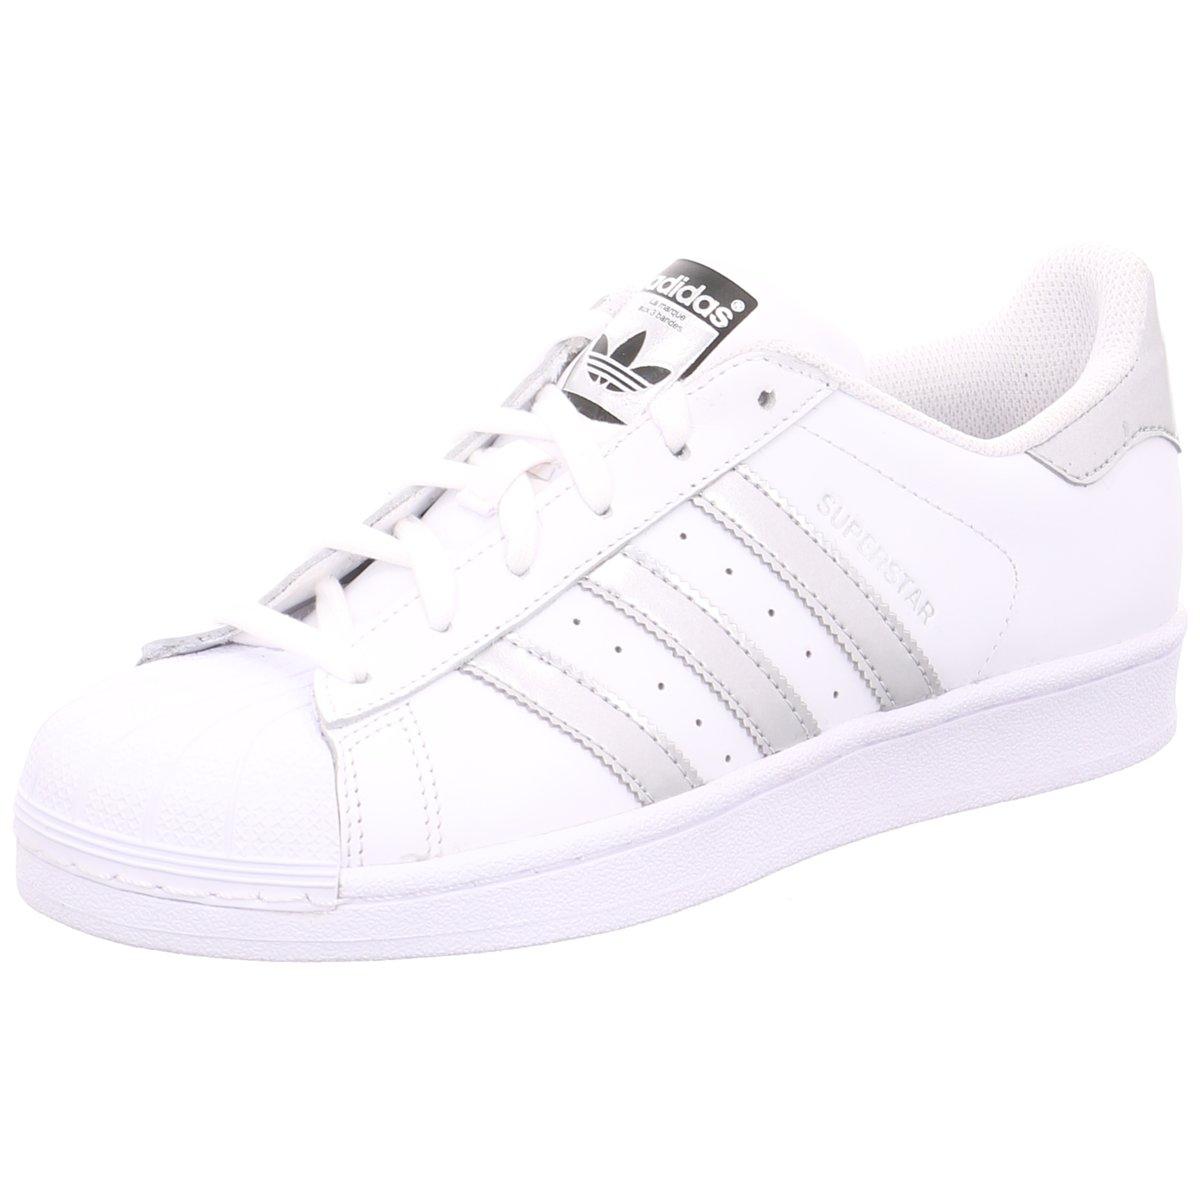 Details zu #S2K adidas Damen Sneaker Superstar Damen Sneaker weiß/silber  AQ3091 weiß